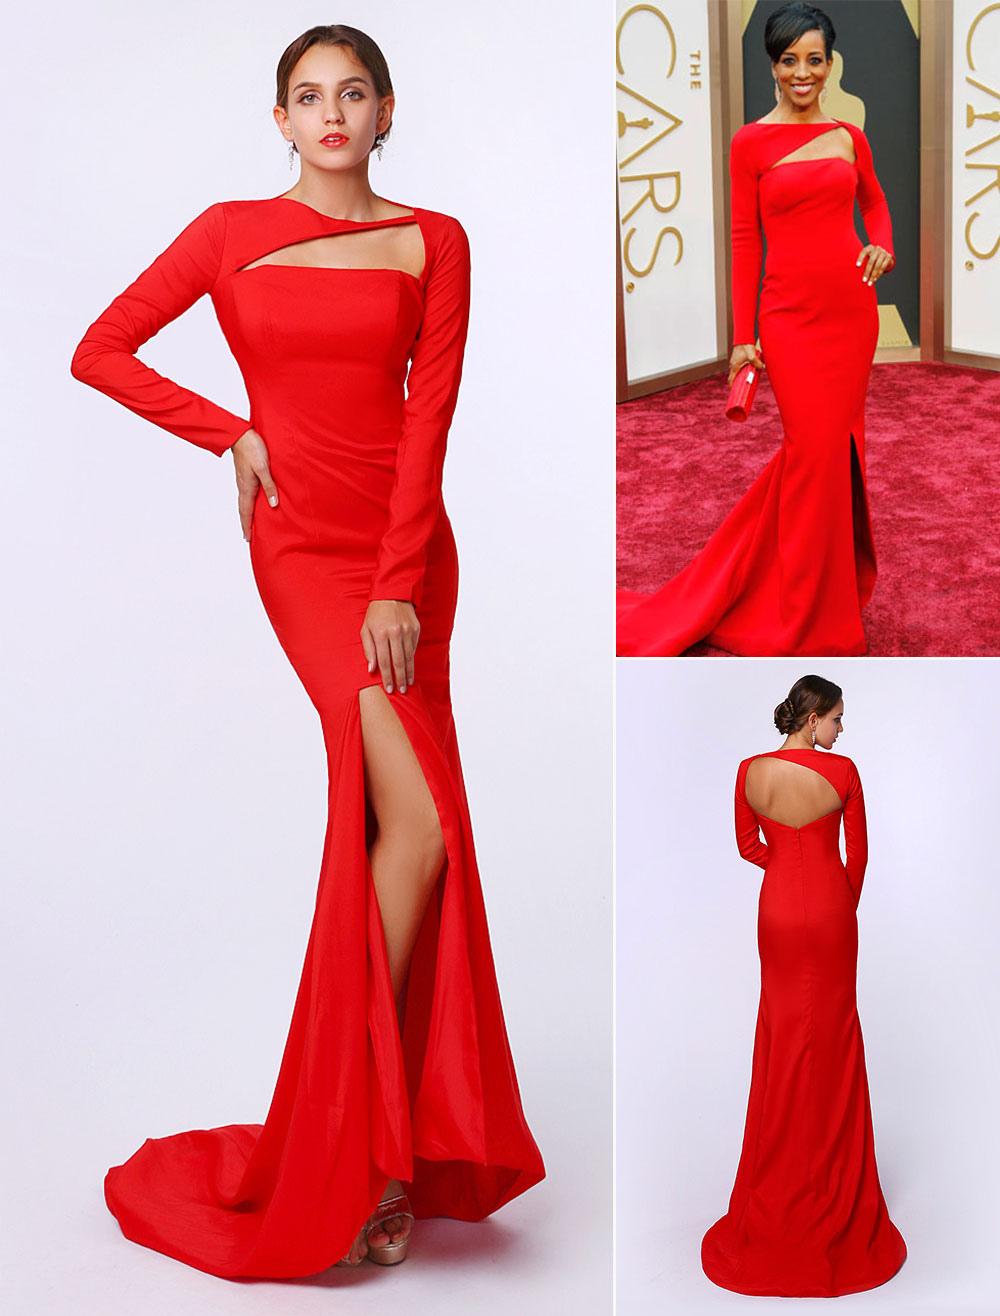 Mermaid Red Elastic Silk Split Sweep Train Evening Dress Inspired by Shaun Robinson at Oscar